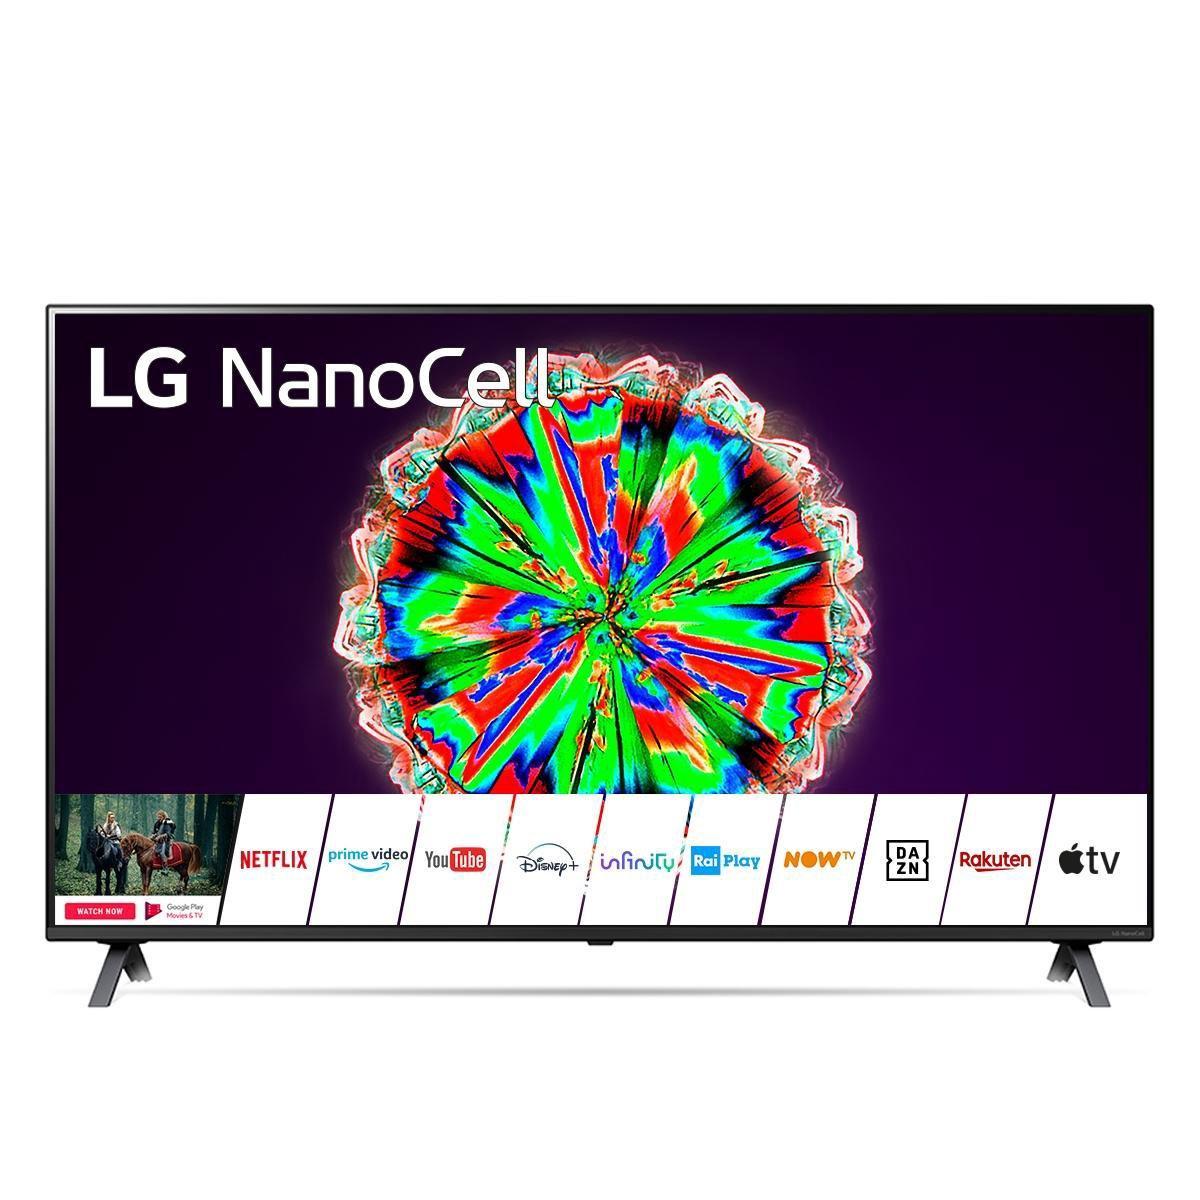 LG NanoCell 49NANO806NA 124,5 cm (49) 4K Ultra HD Smart TV Wi-Fi Titanium